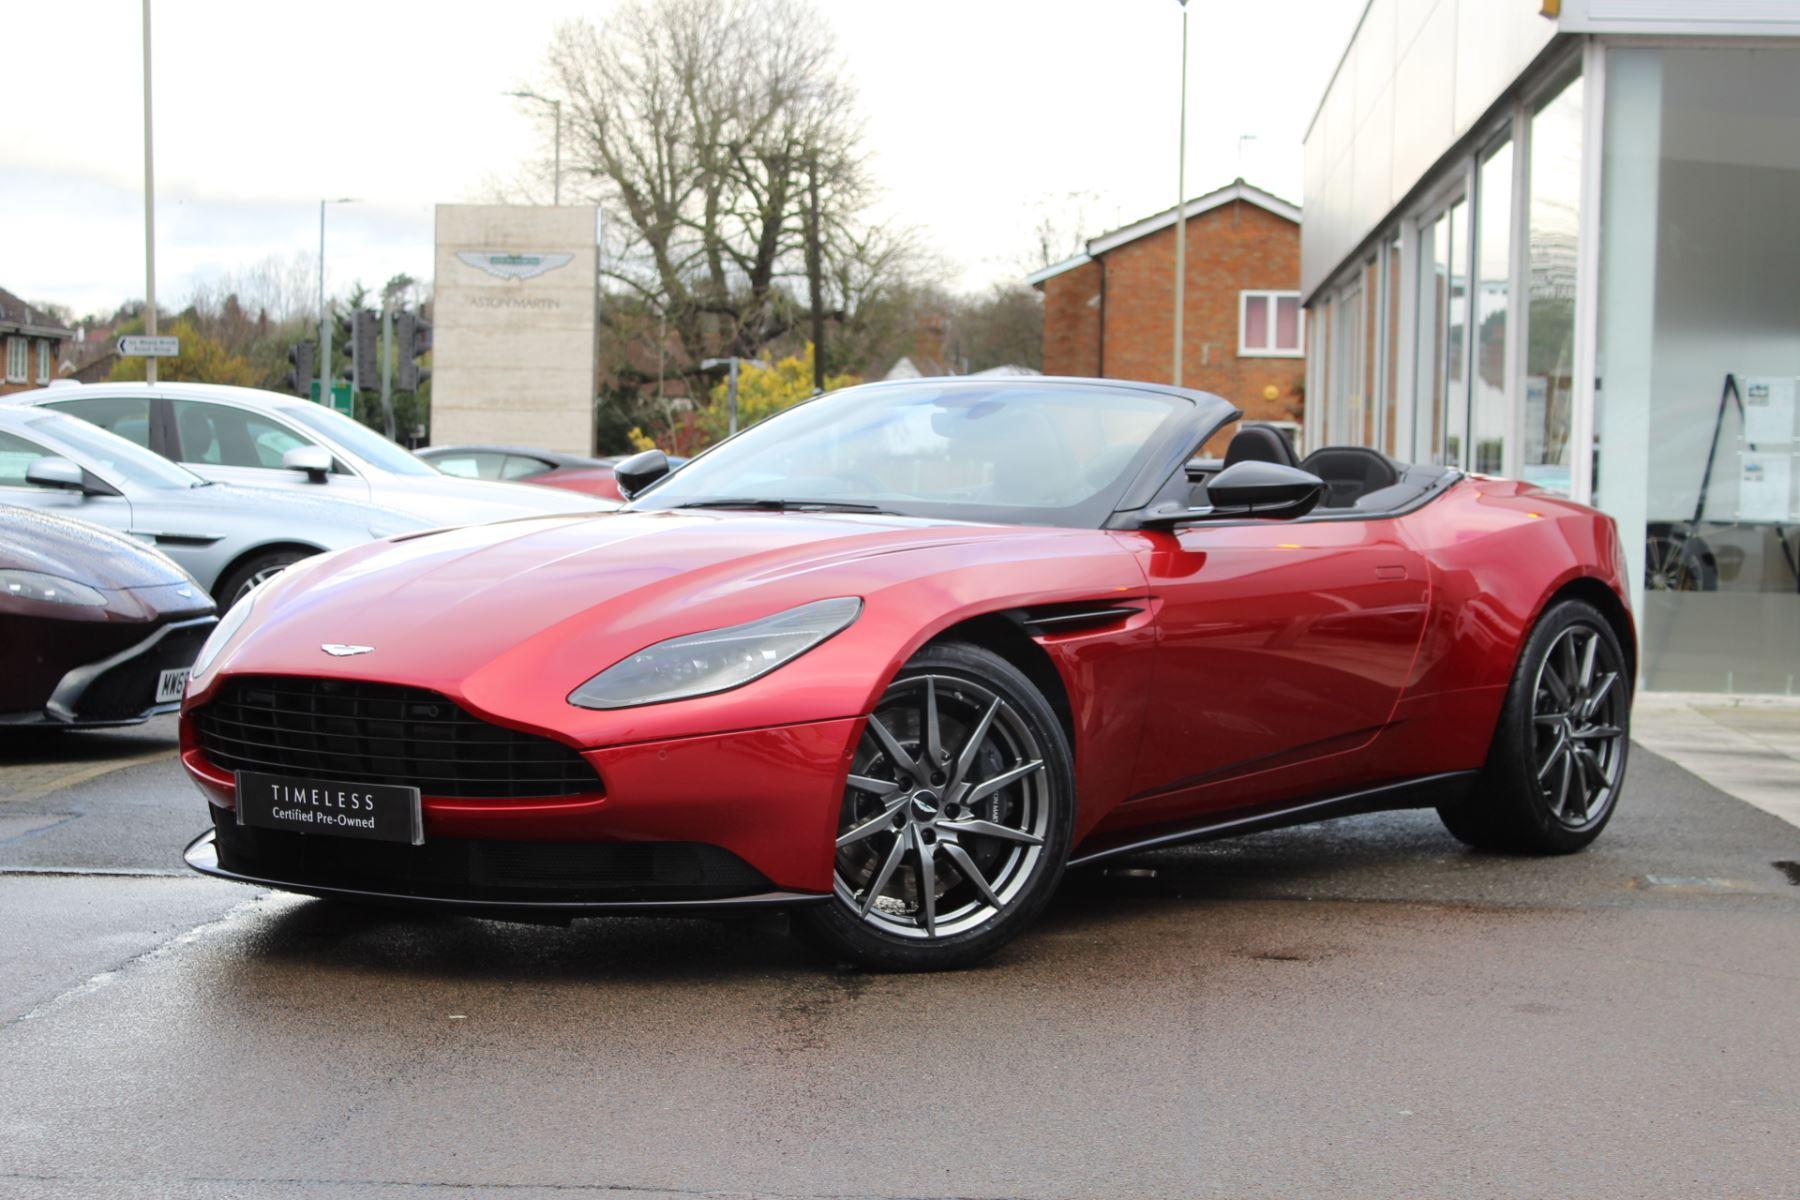 Used Aston Martin Automatic Cars For Sale Grange